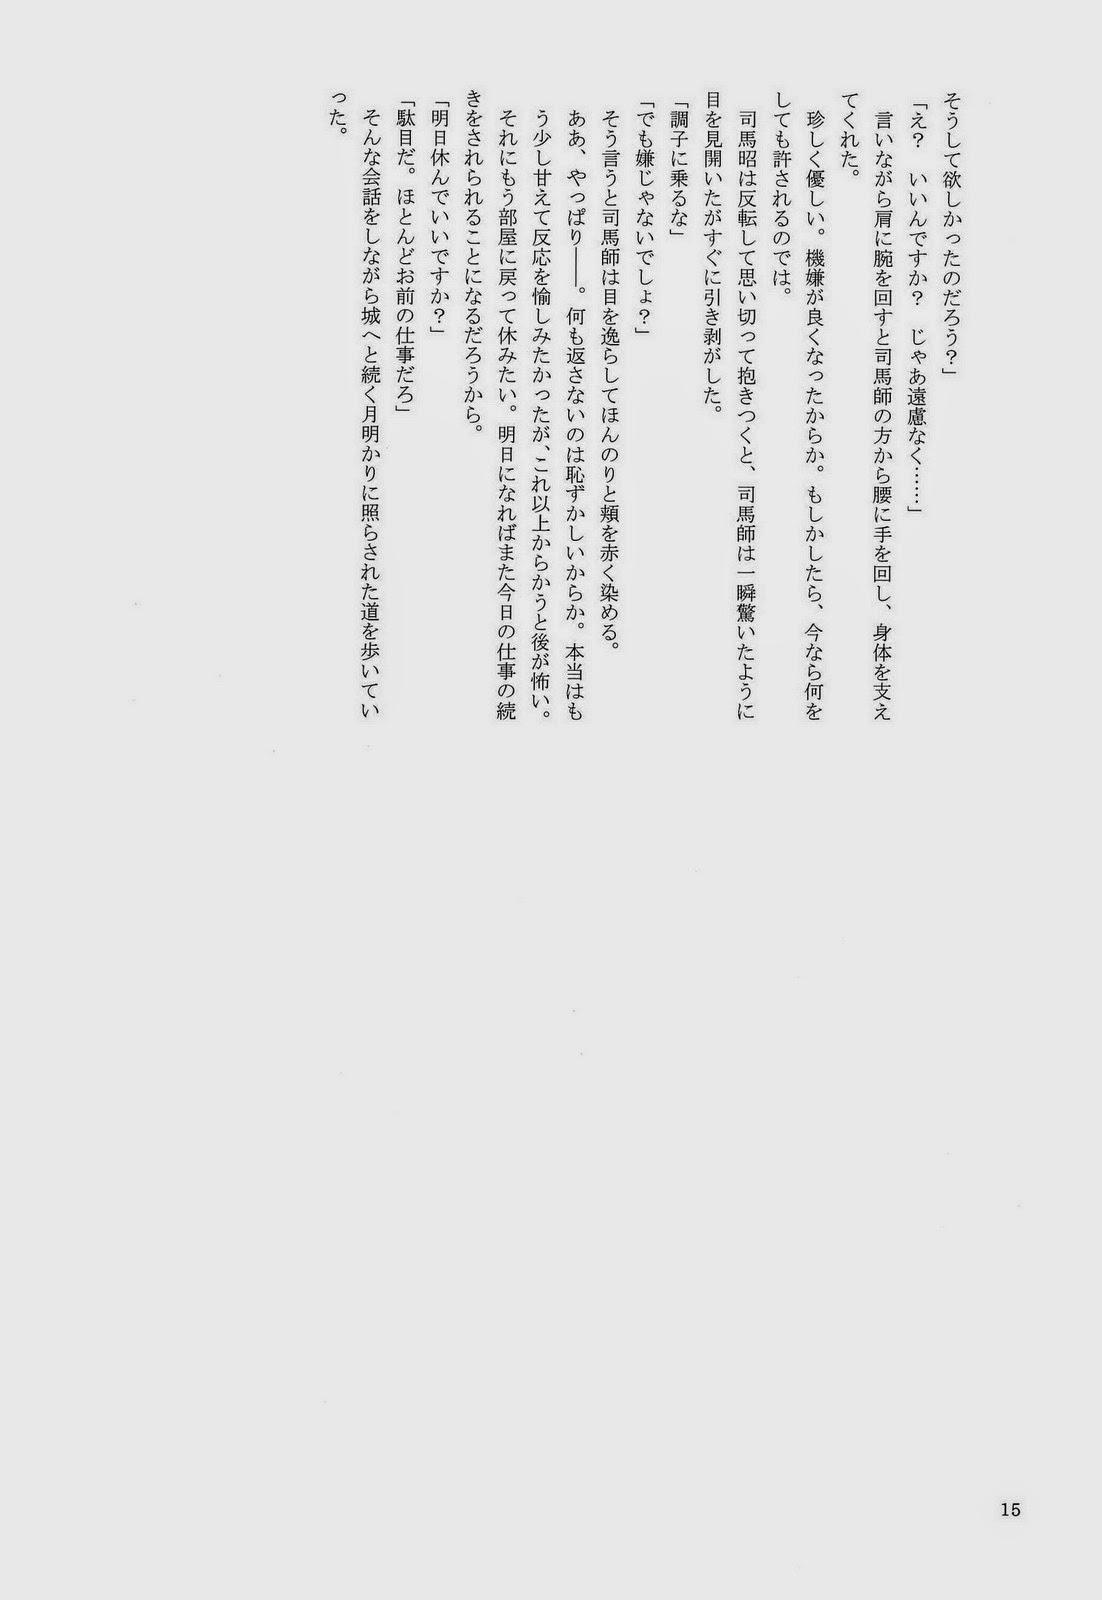 Shiba ShowTime 17